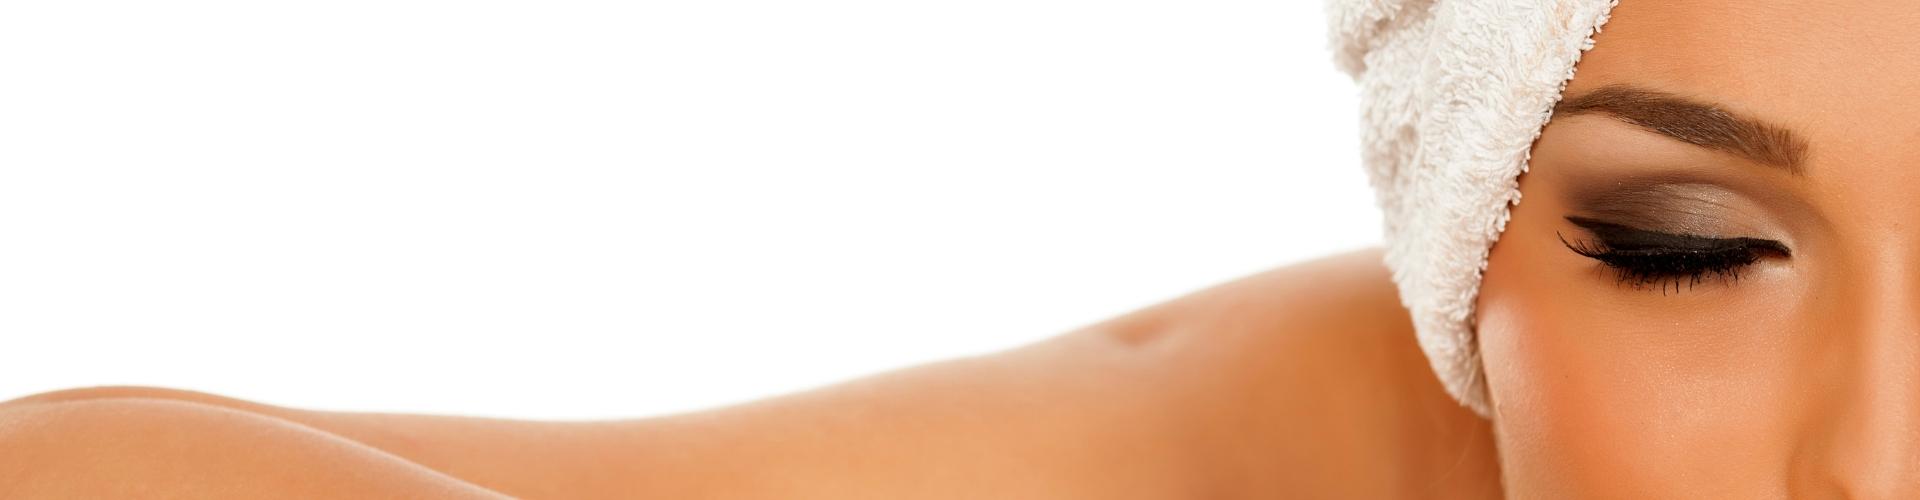 c4 hudvård